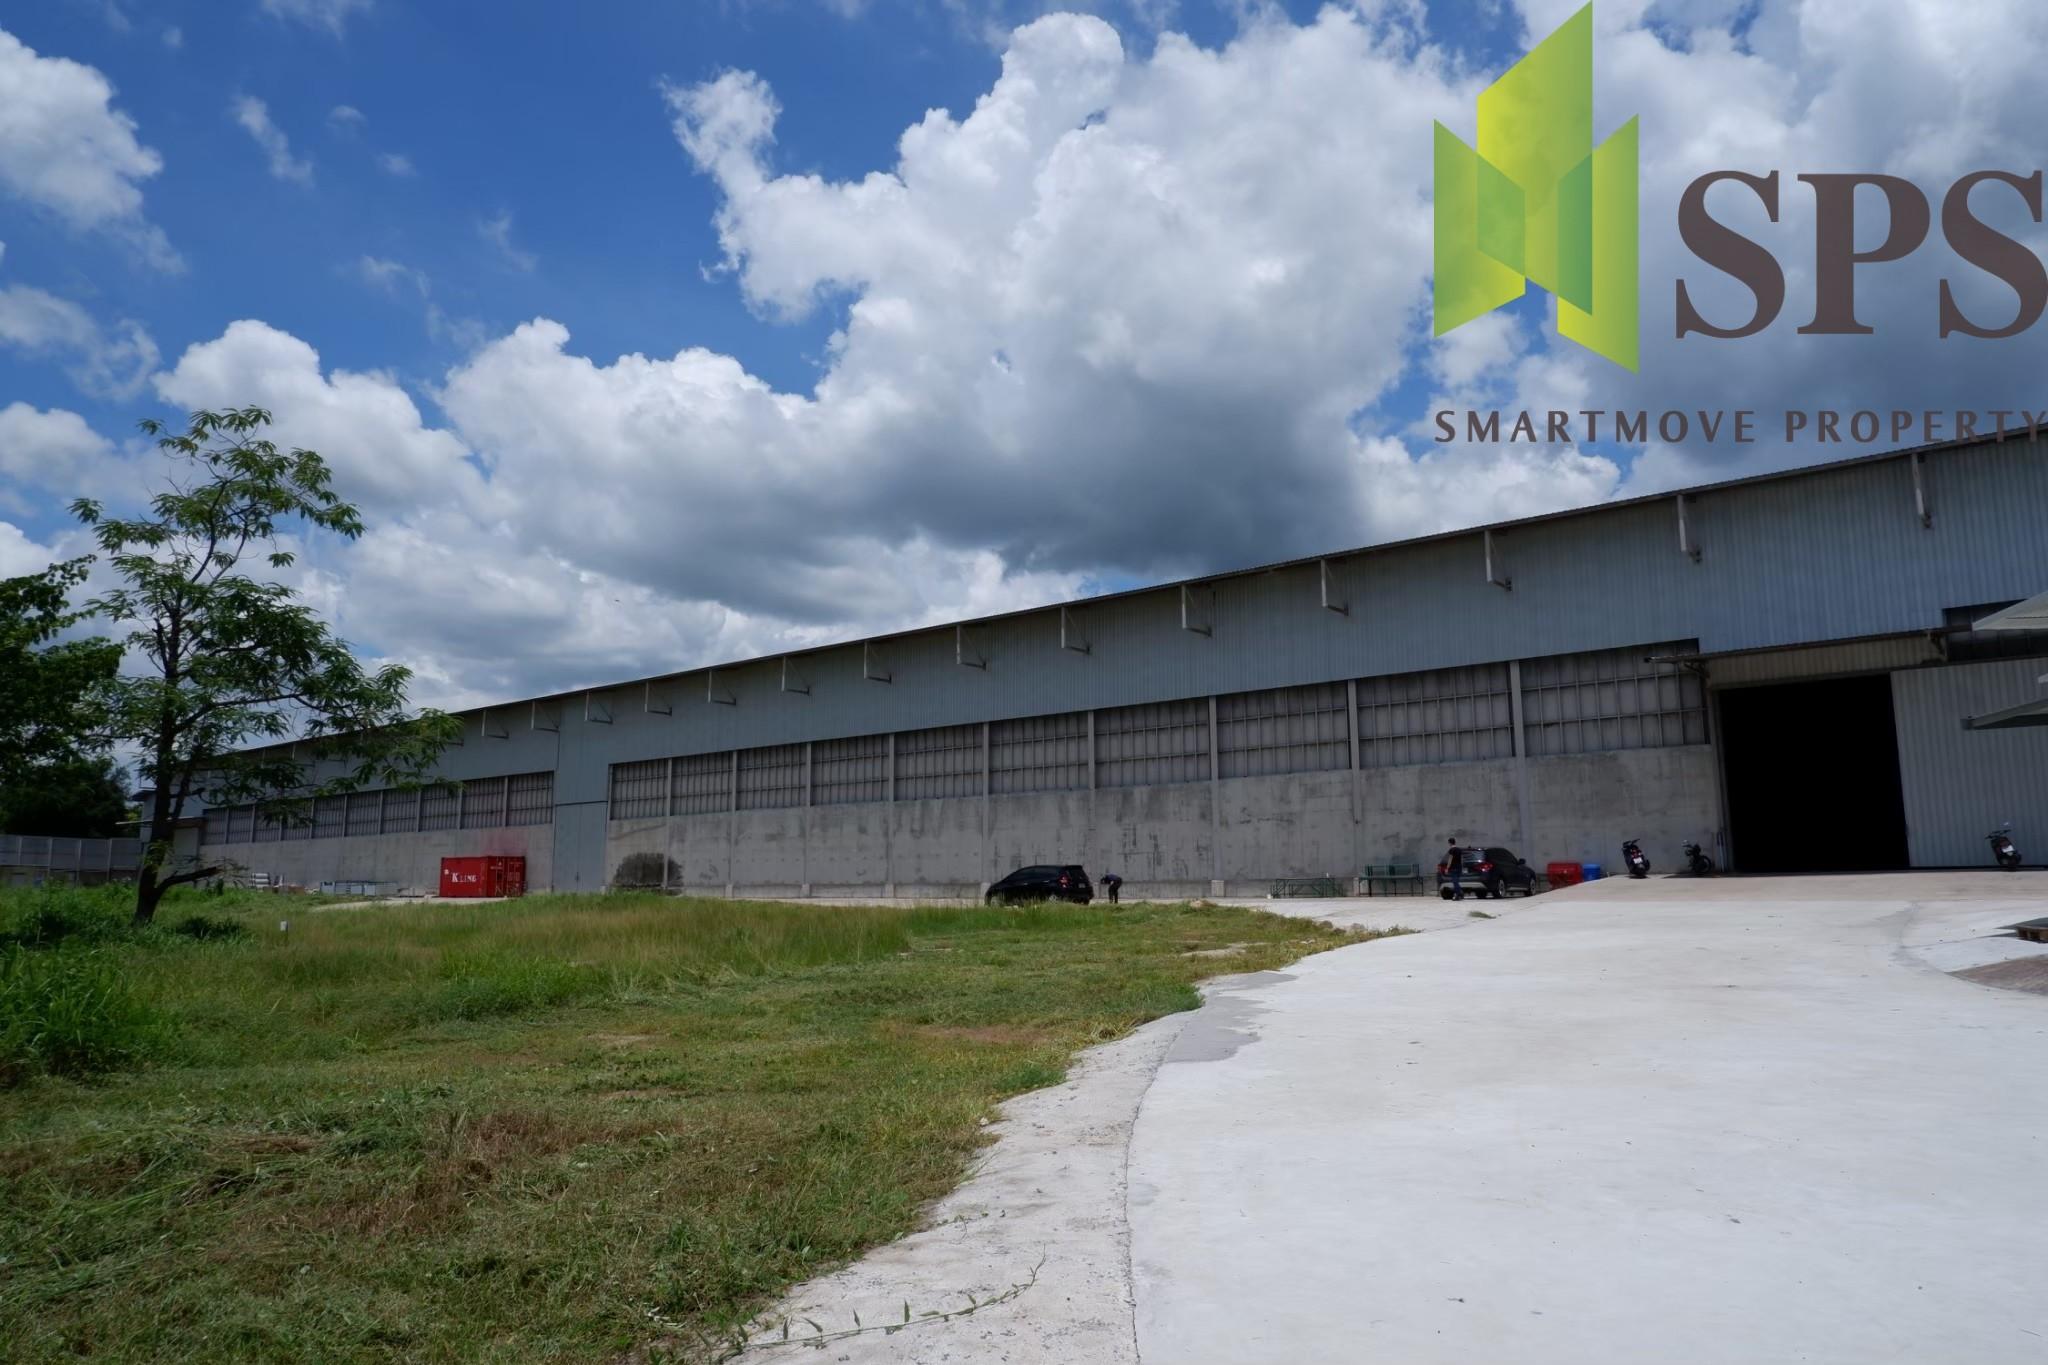 Warehouse Chonburi RENT/SALE ชลบุรี หนองรี (ที่ดินสีเหลืองอ่อน)(SPS-GW428)